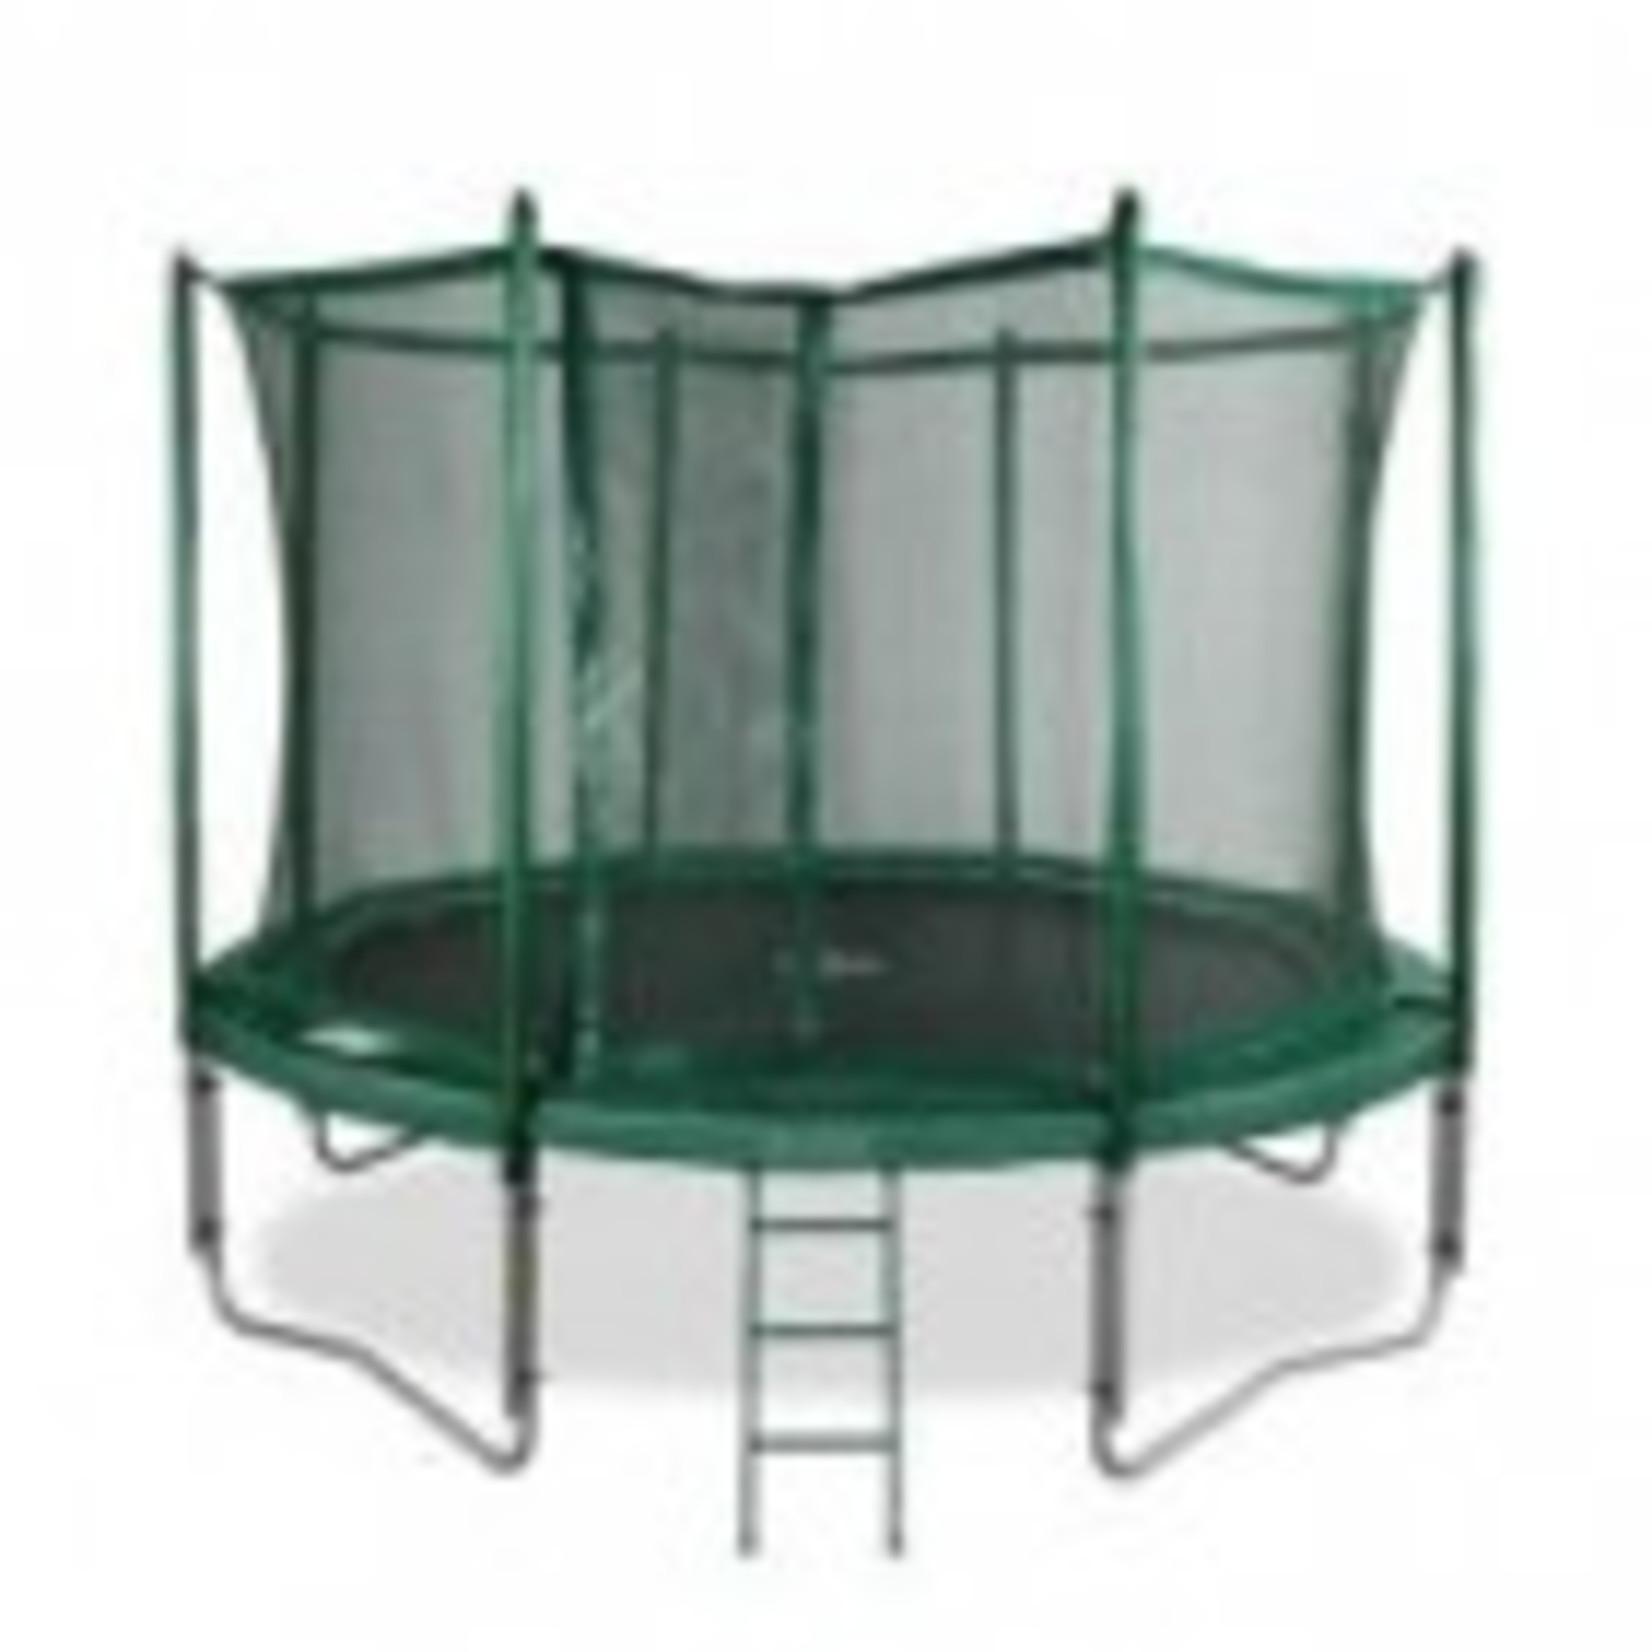 Avyna Top kwaliteit trampoline compleet met veiligheidsnet en trap.Doorsnee 245cm en hoogte 67cm